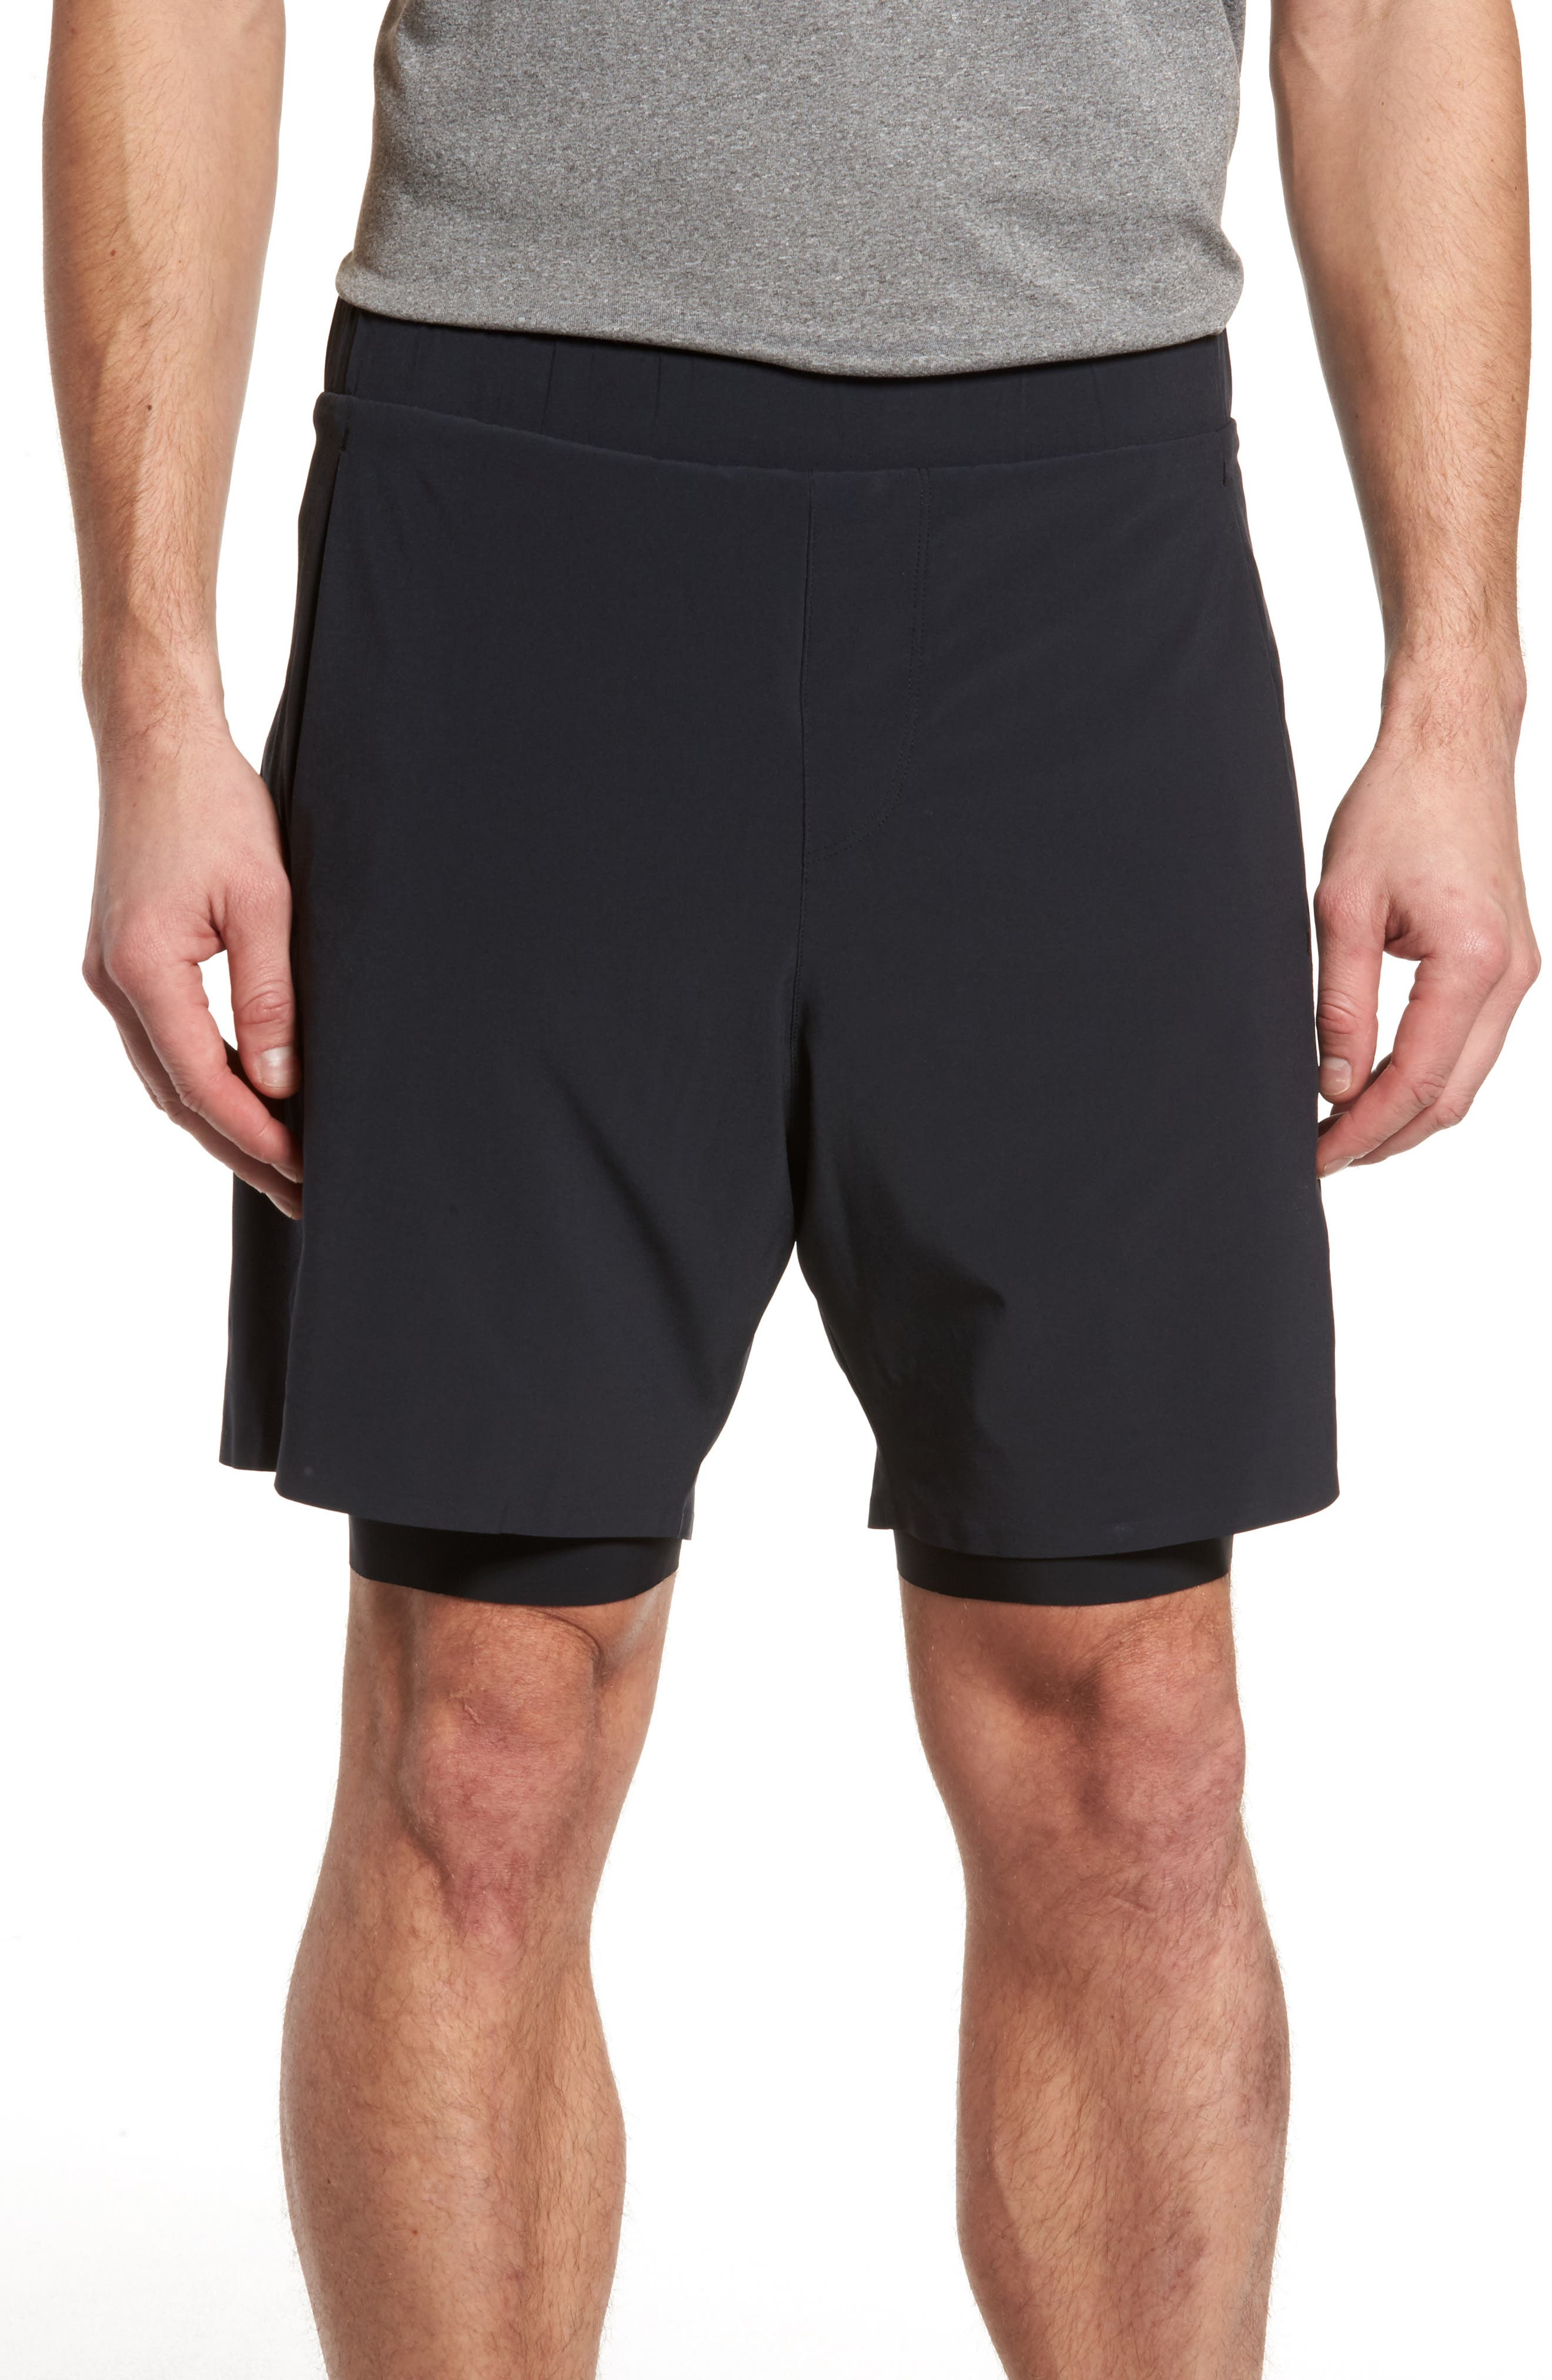 Interval 2-in-1 Shorts,                             Main thumbnail 1, color,                             Black